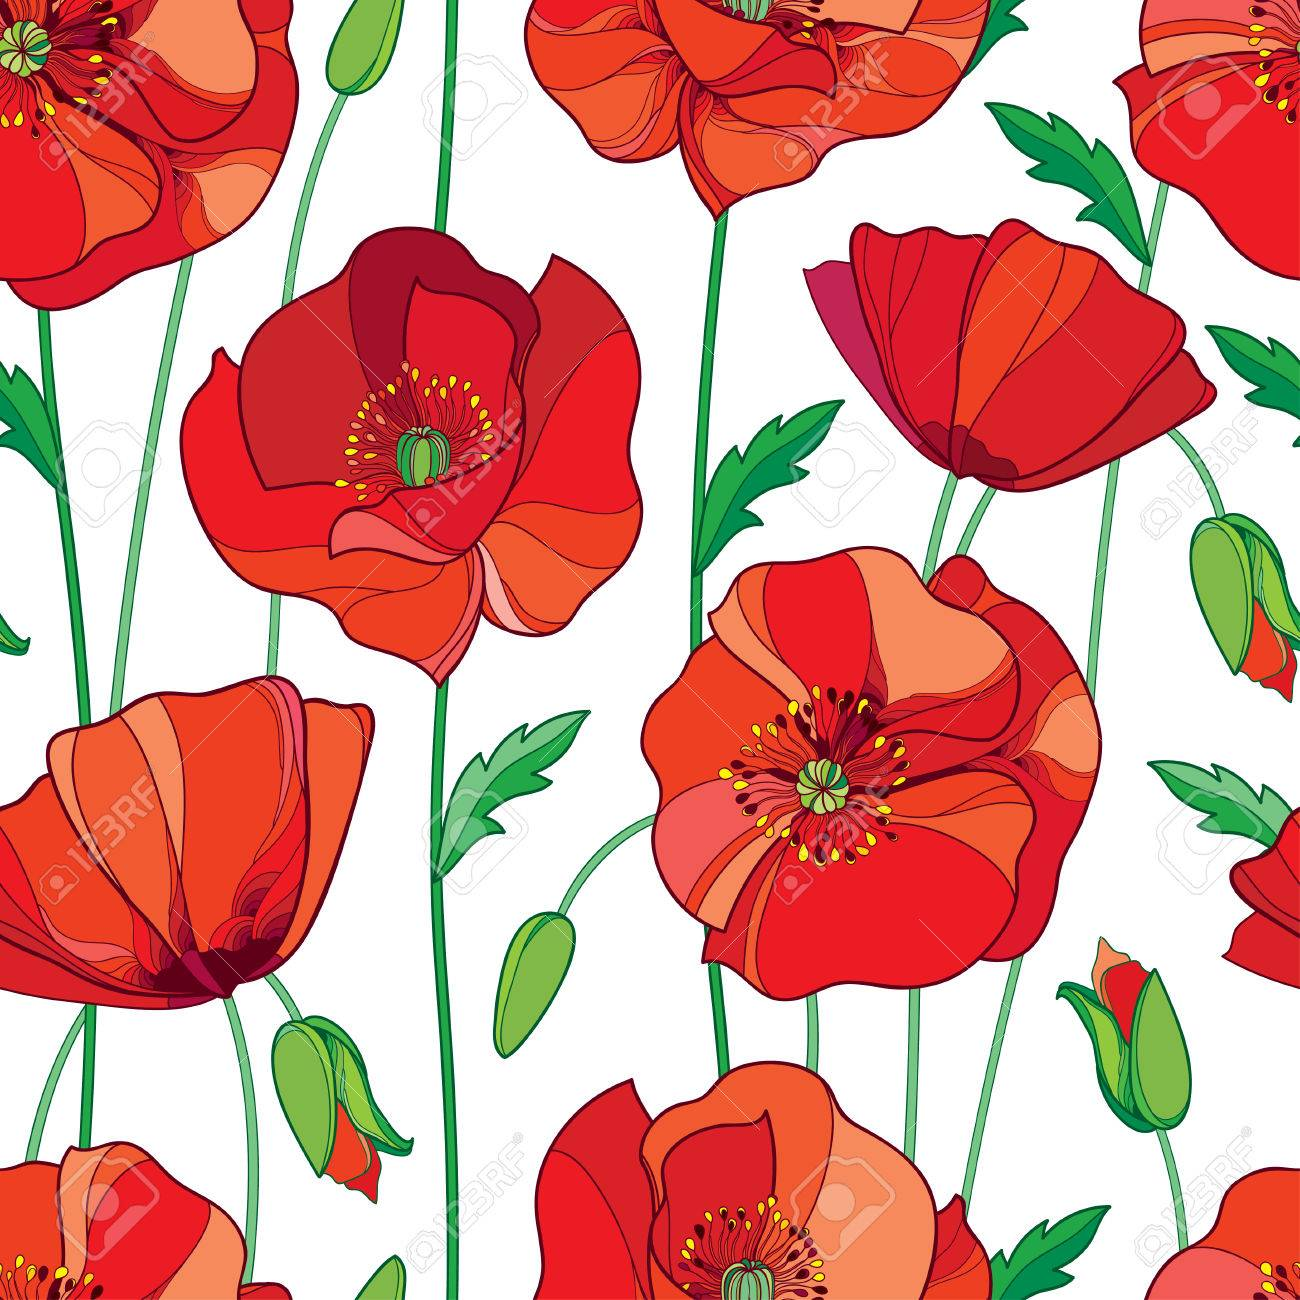 Poppy flower in hindi choice image flower decoration ideas poppy flower in hindi choice image flower decoration ideas poppy flower in hindi images flower decoration mightylinksfo